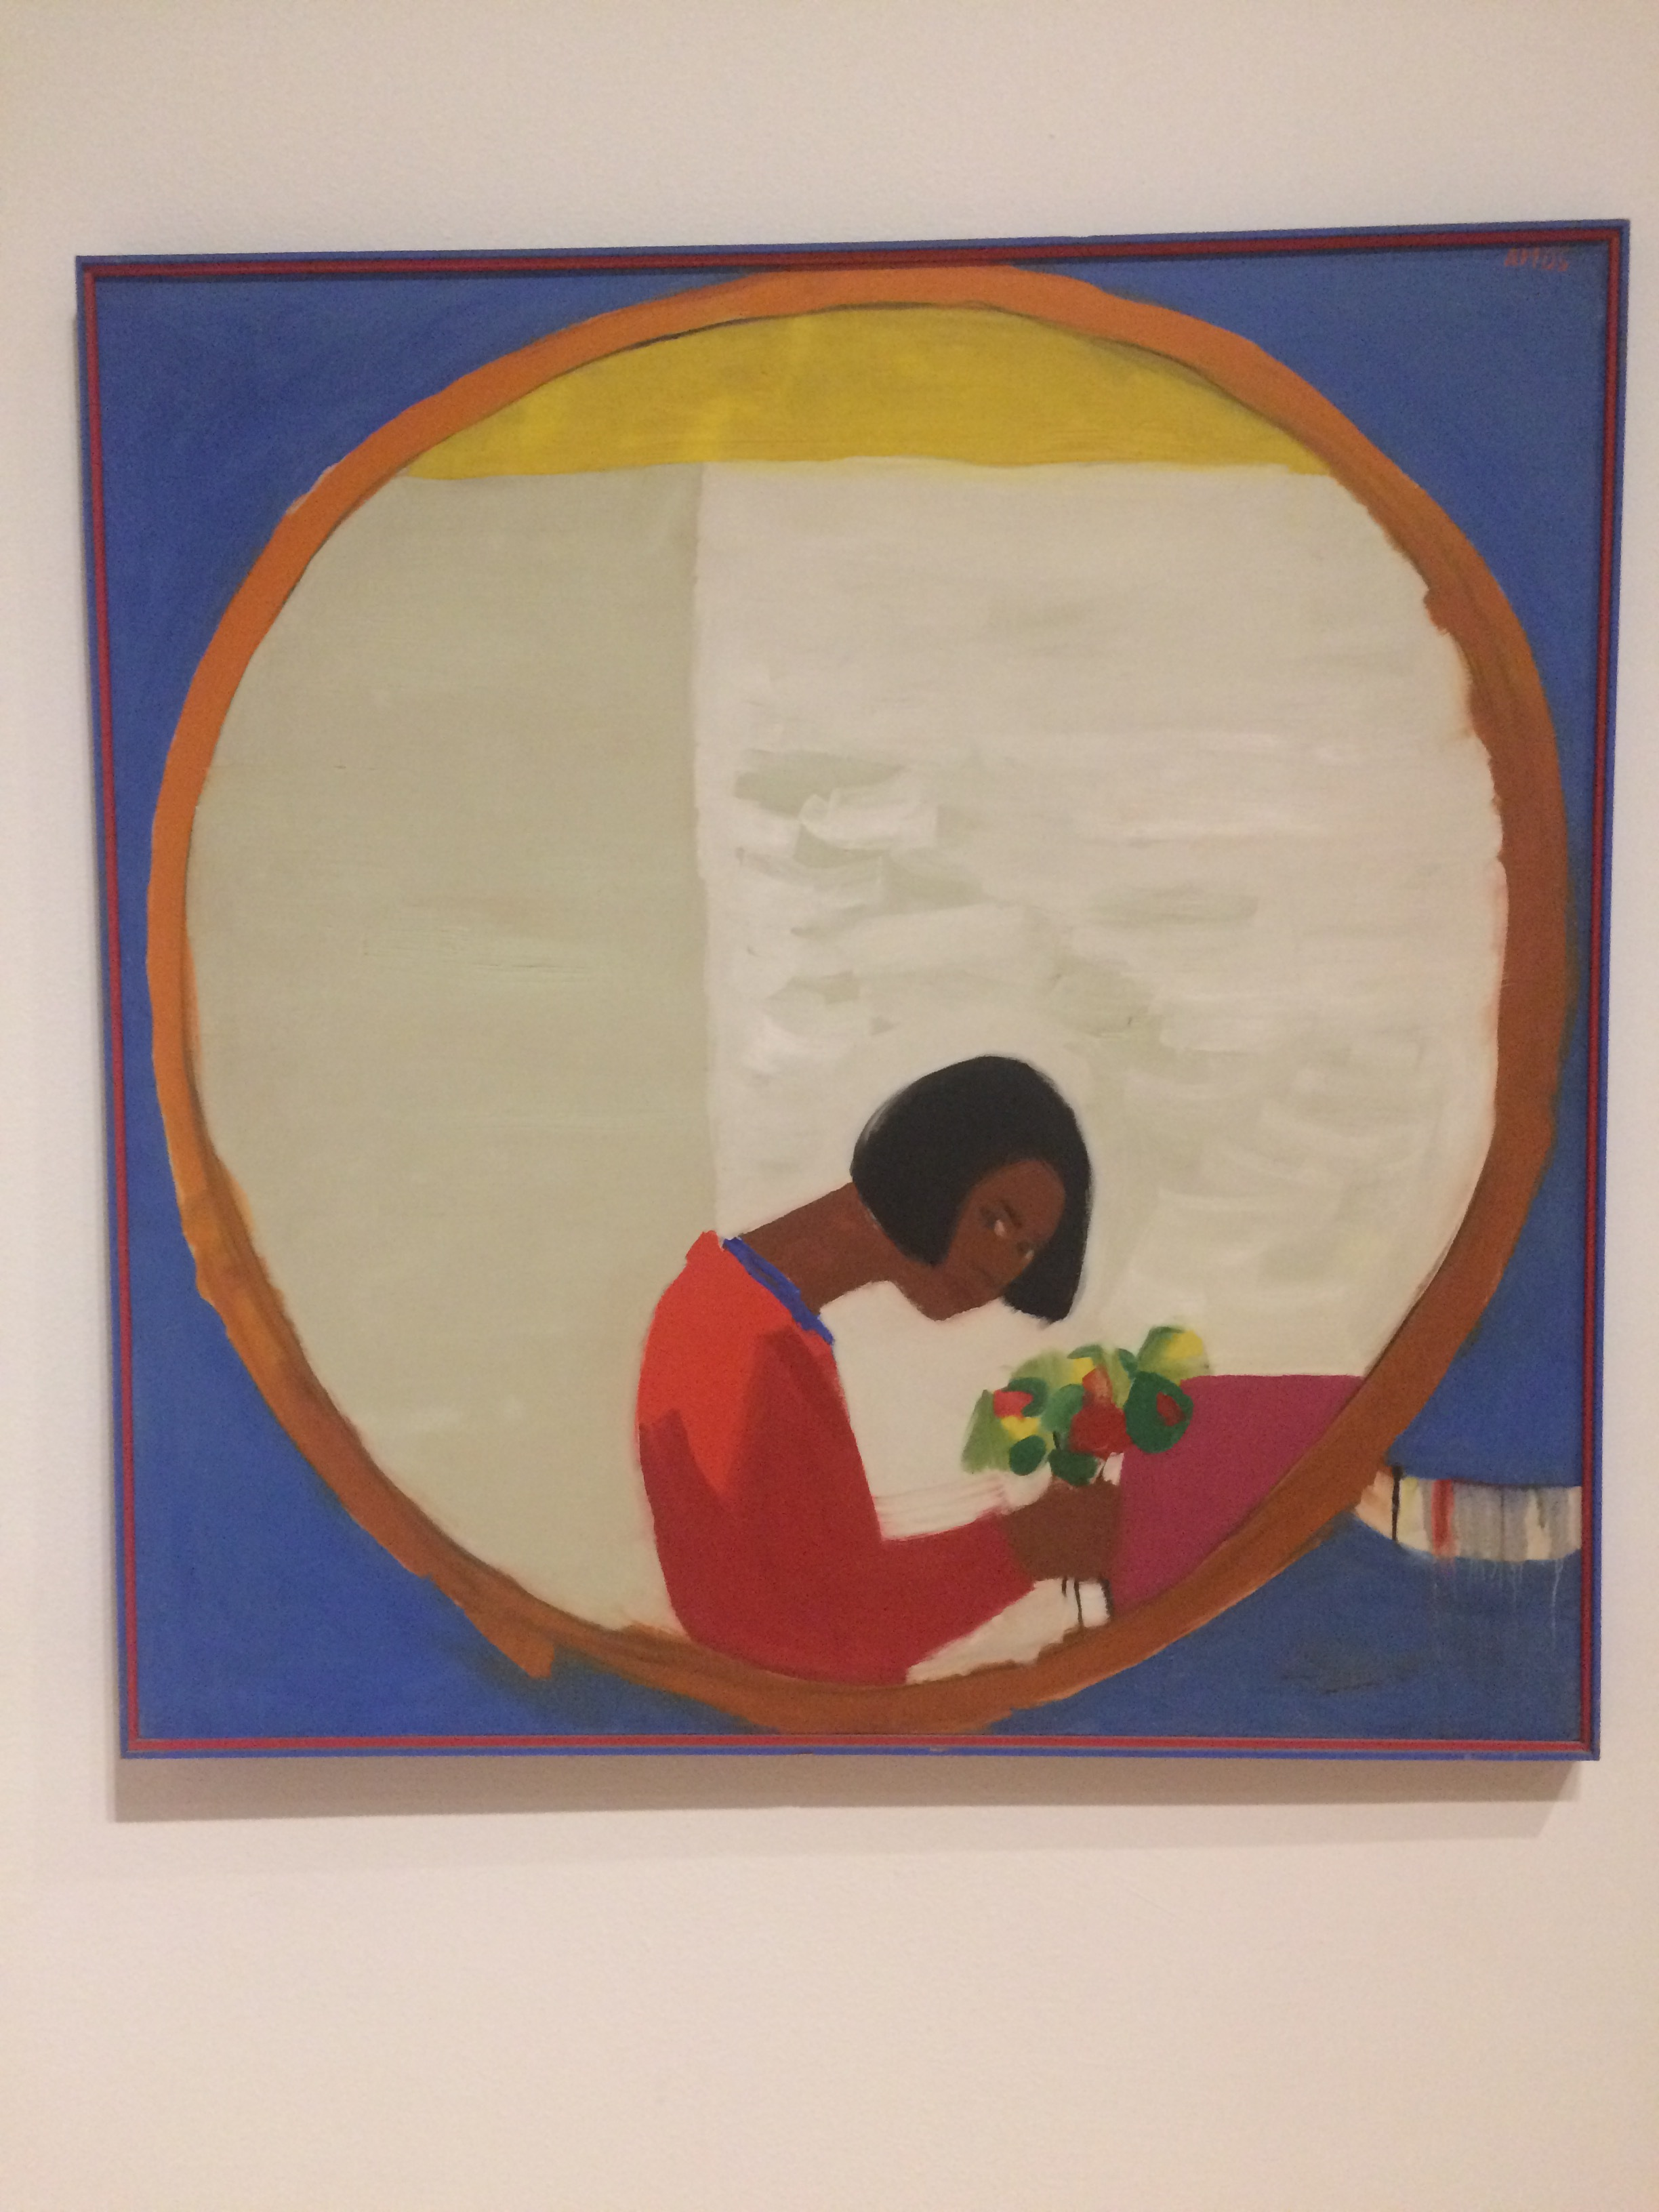 Emmas Amos,  Flower Sniffer , 1966